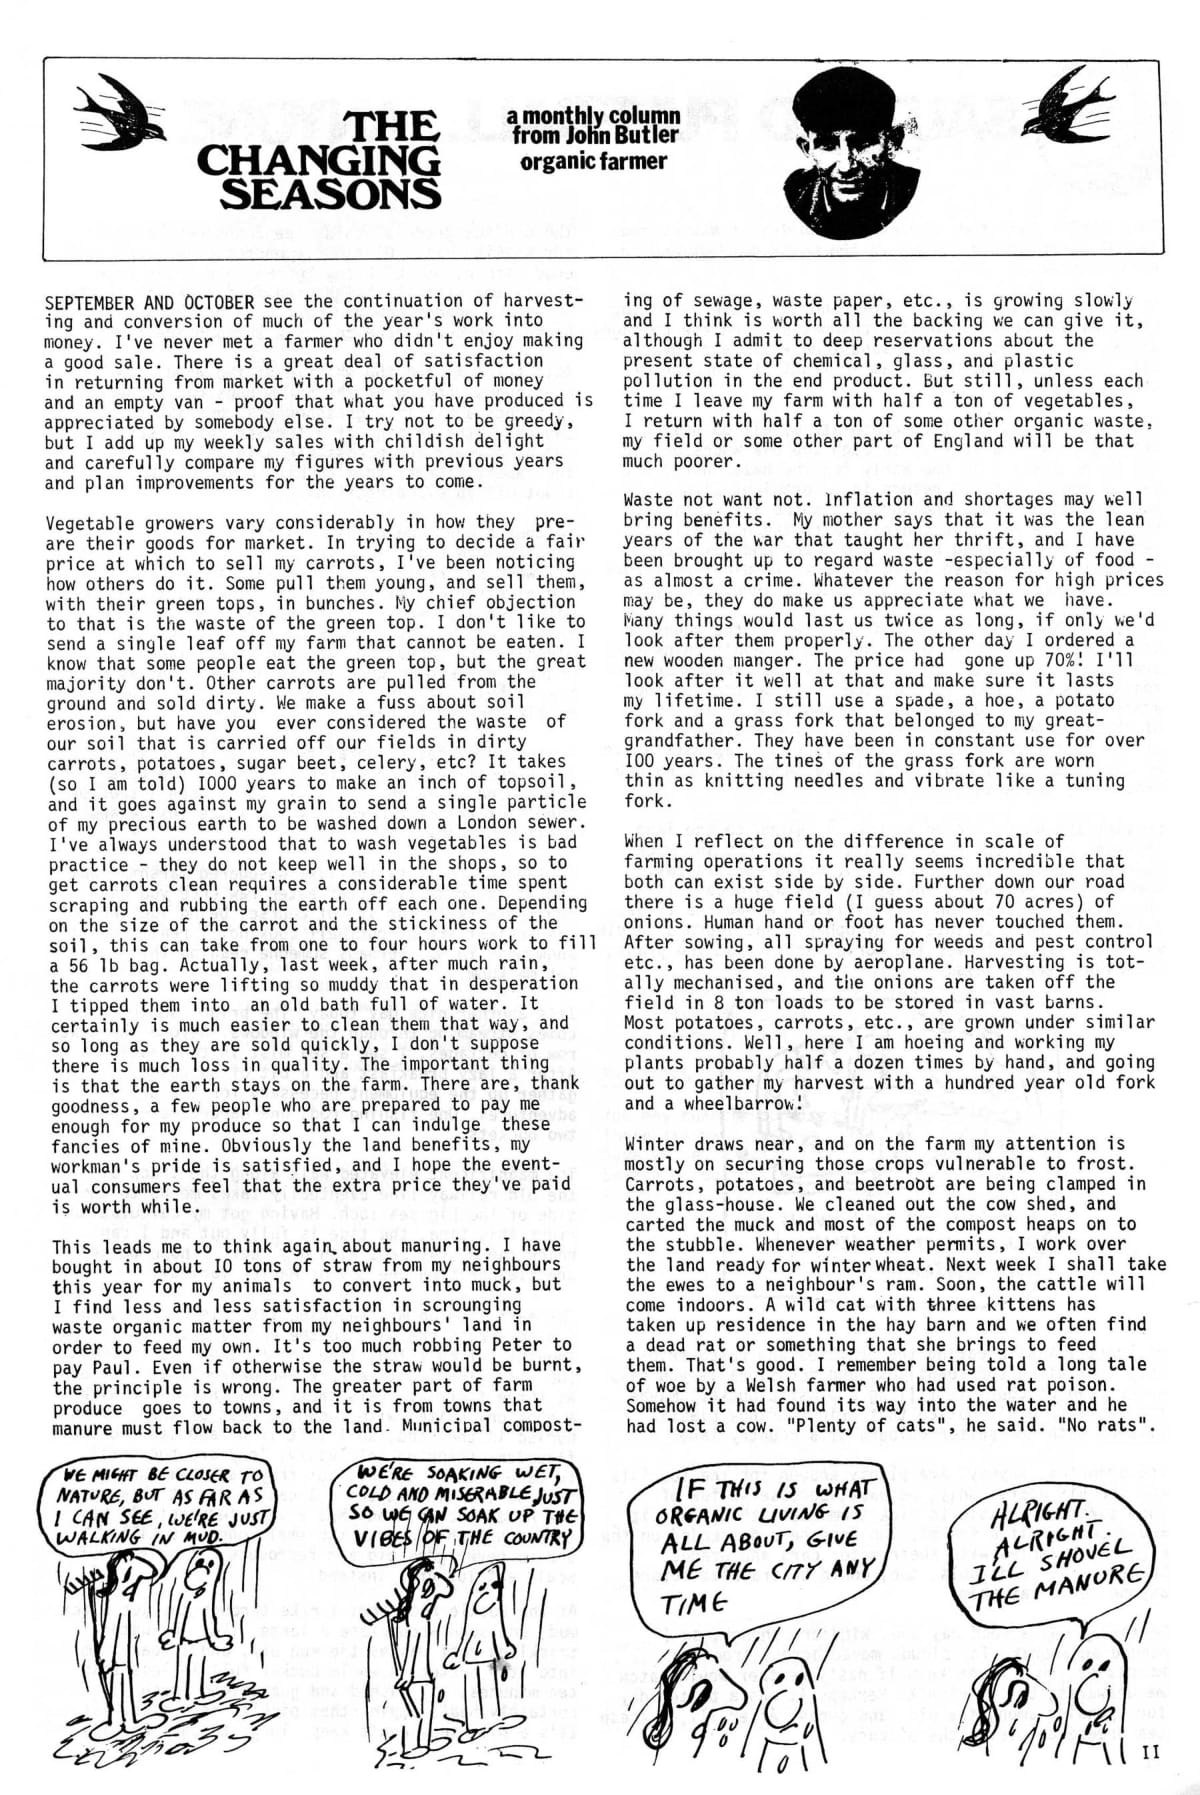 seed-v2-n10-oct1973-11.jpg